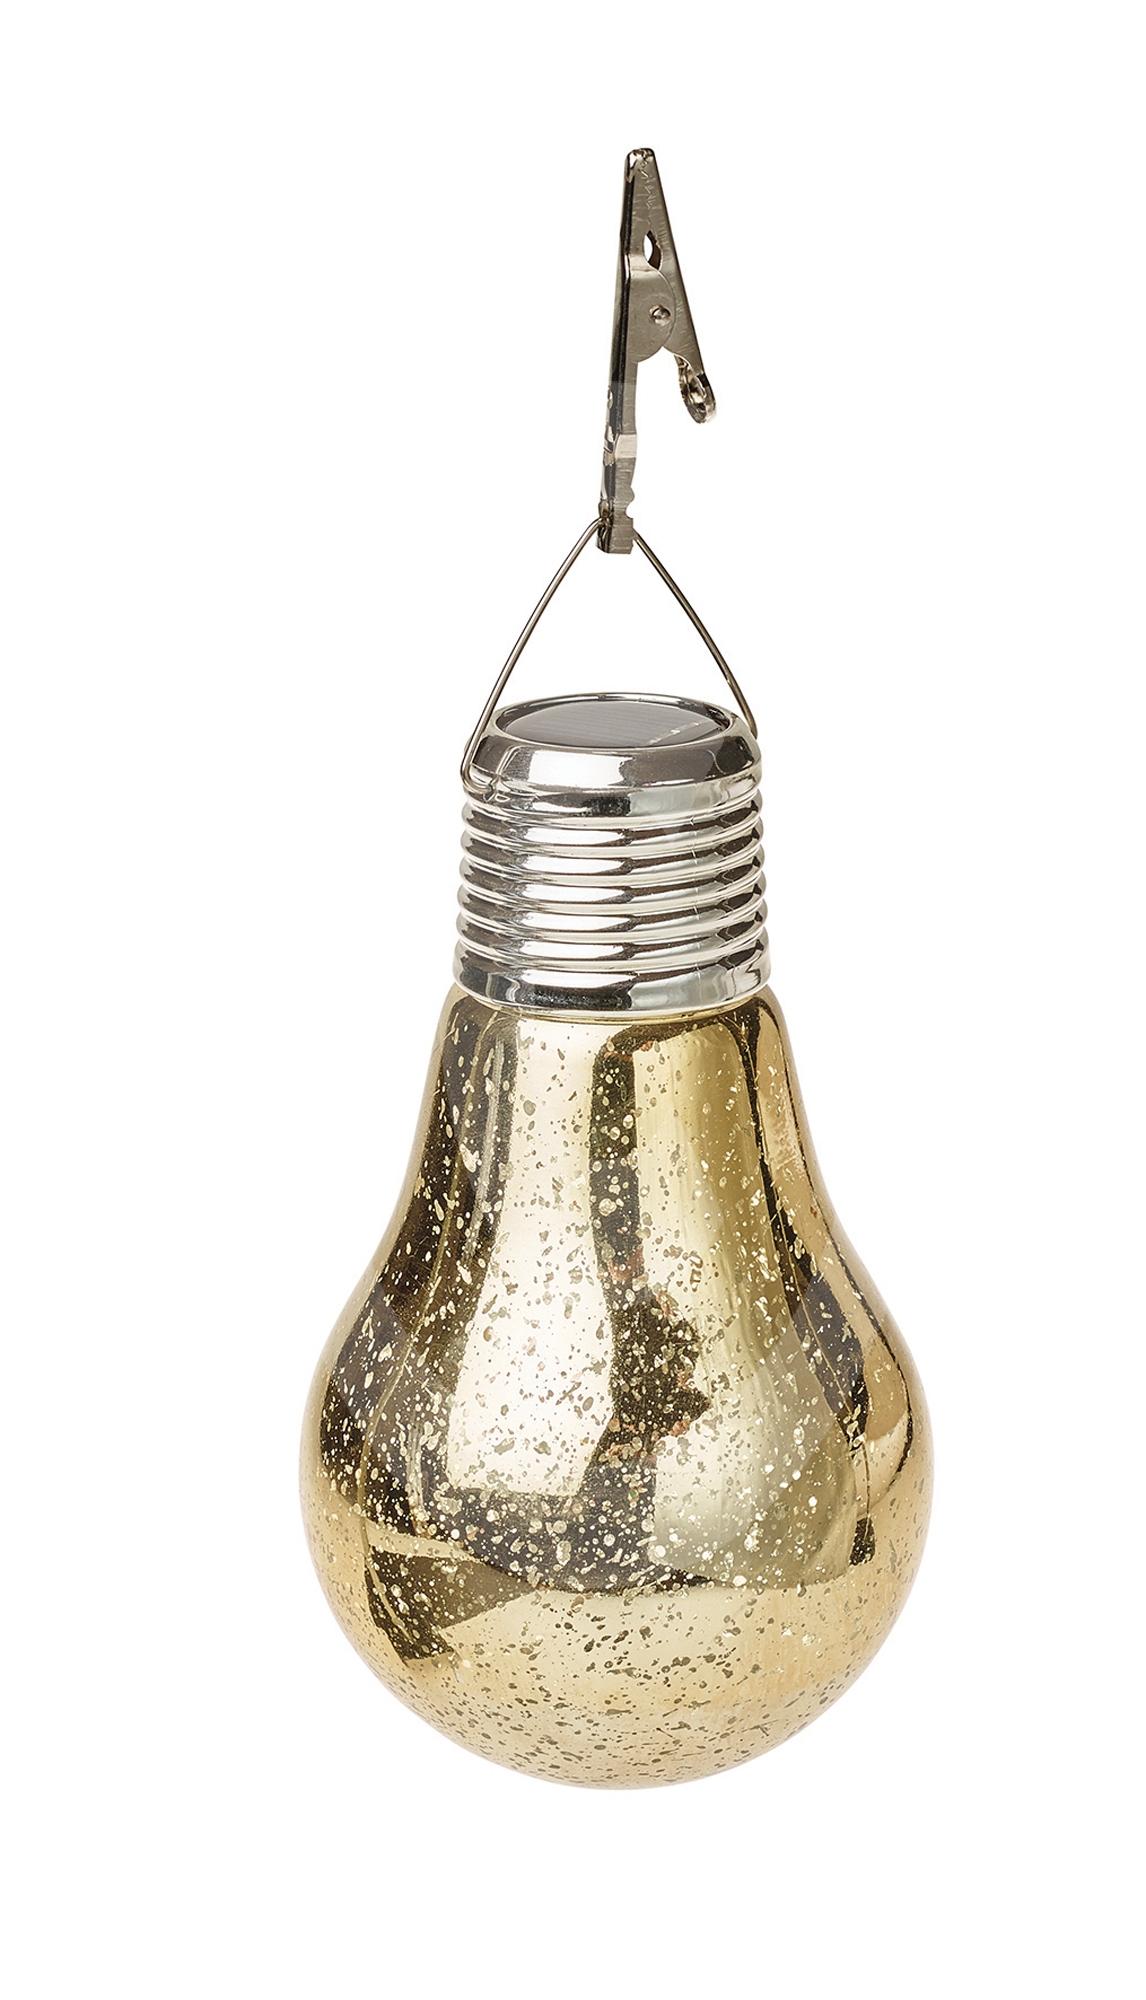 Solarleuchte Hängend Solar Lampe Glas Glüh Birne Vintage Gold Silber